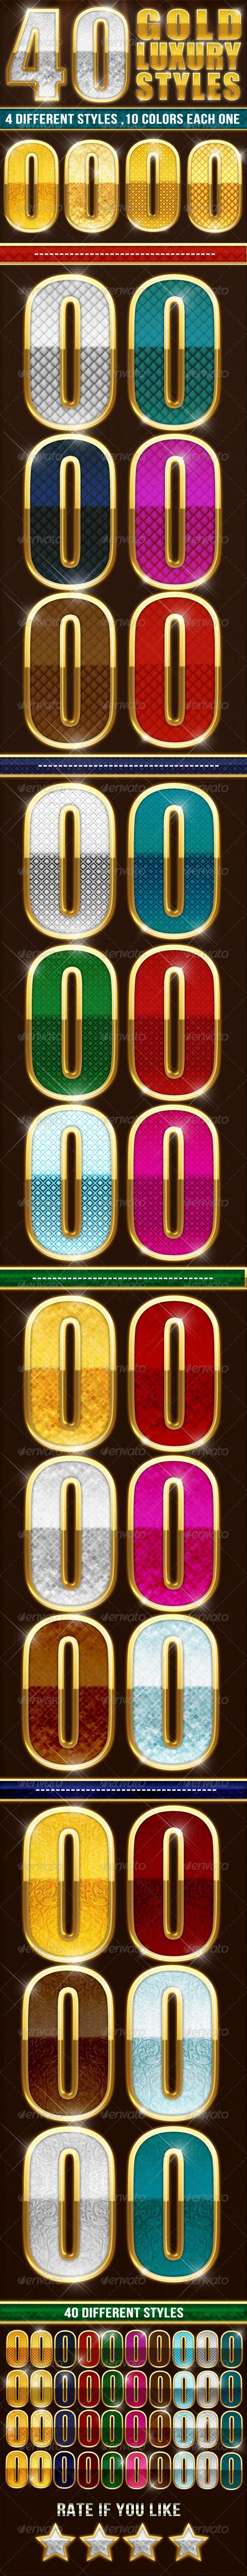 40 Elegant Gold Luxury Styles - Text Effects Styles